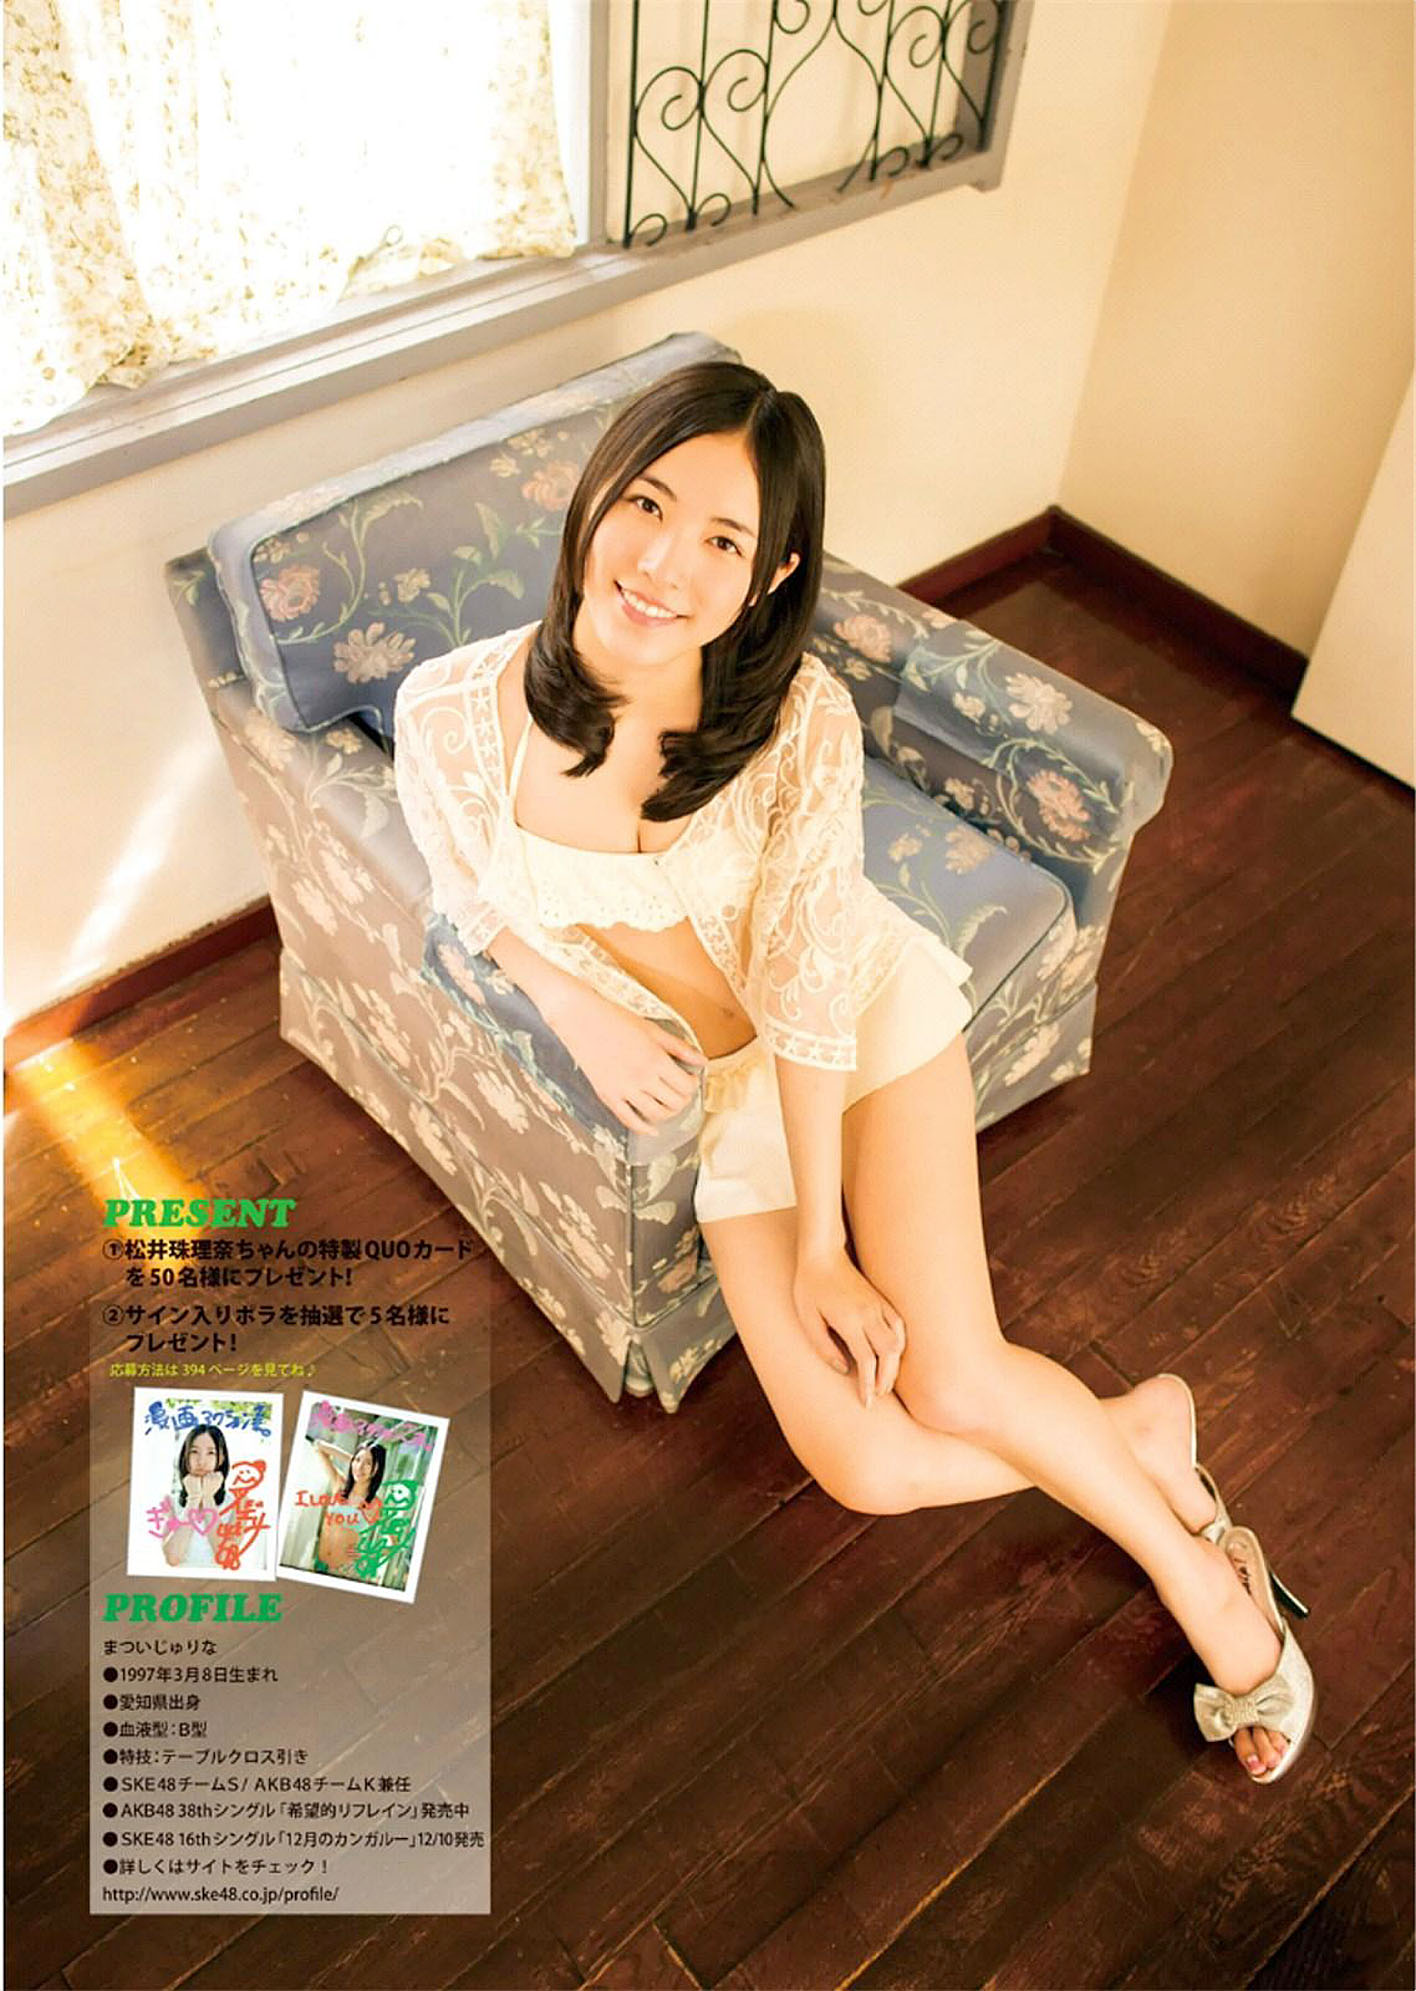 MJurina Manga Action 141216 08.jpg